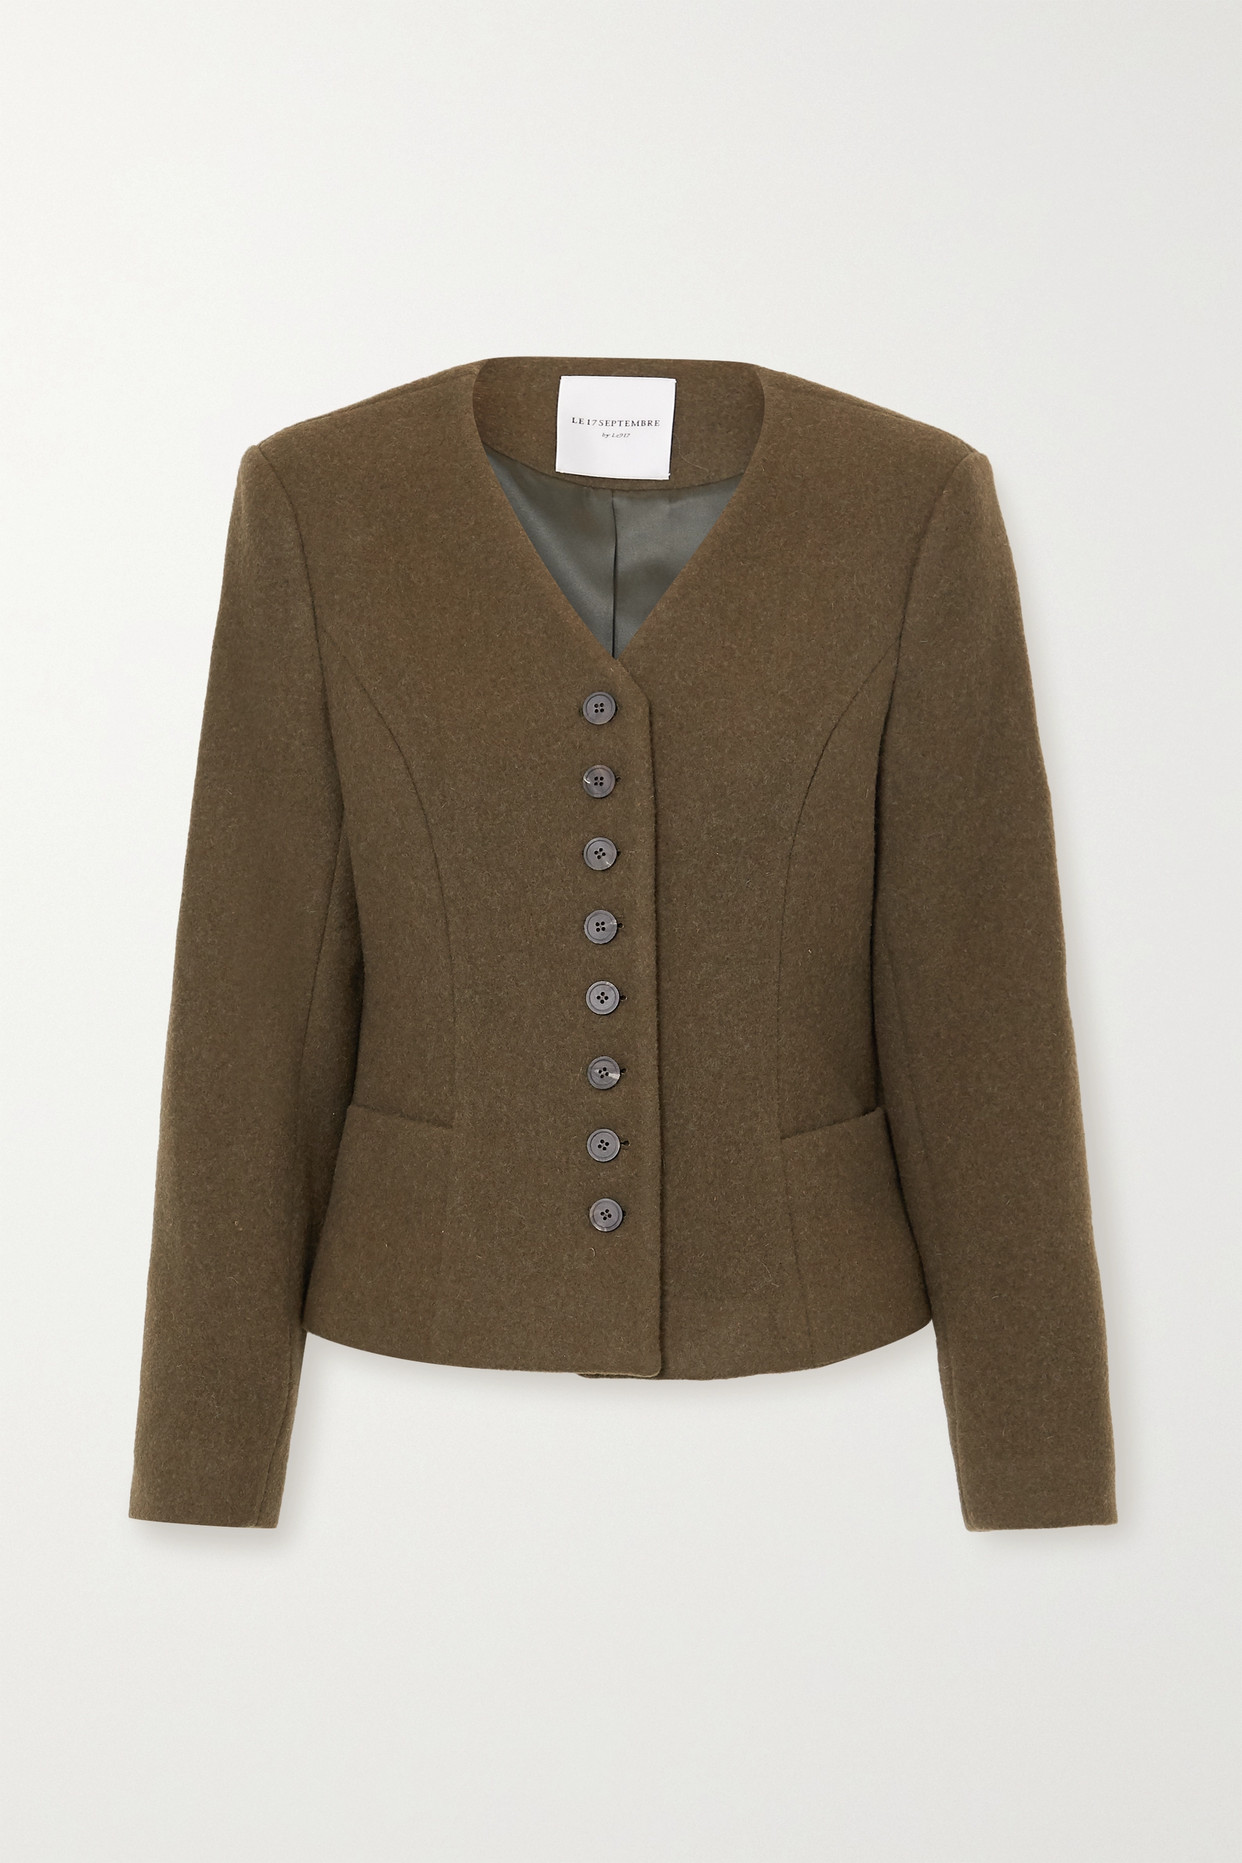 LE 17 SEPTEMBRE - 羊毛混纺外套 - 绿色 - FR38